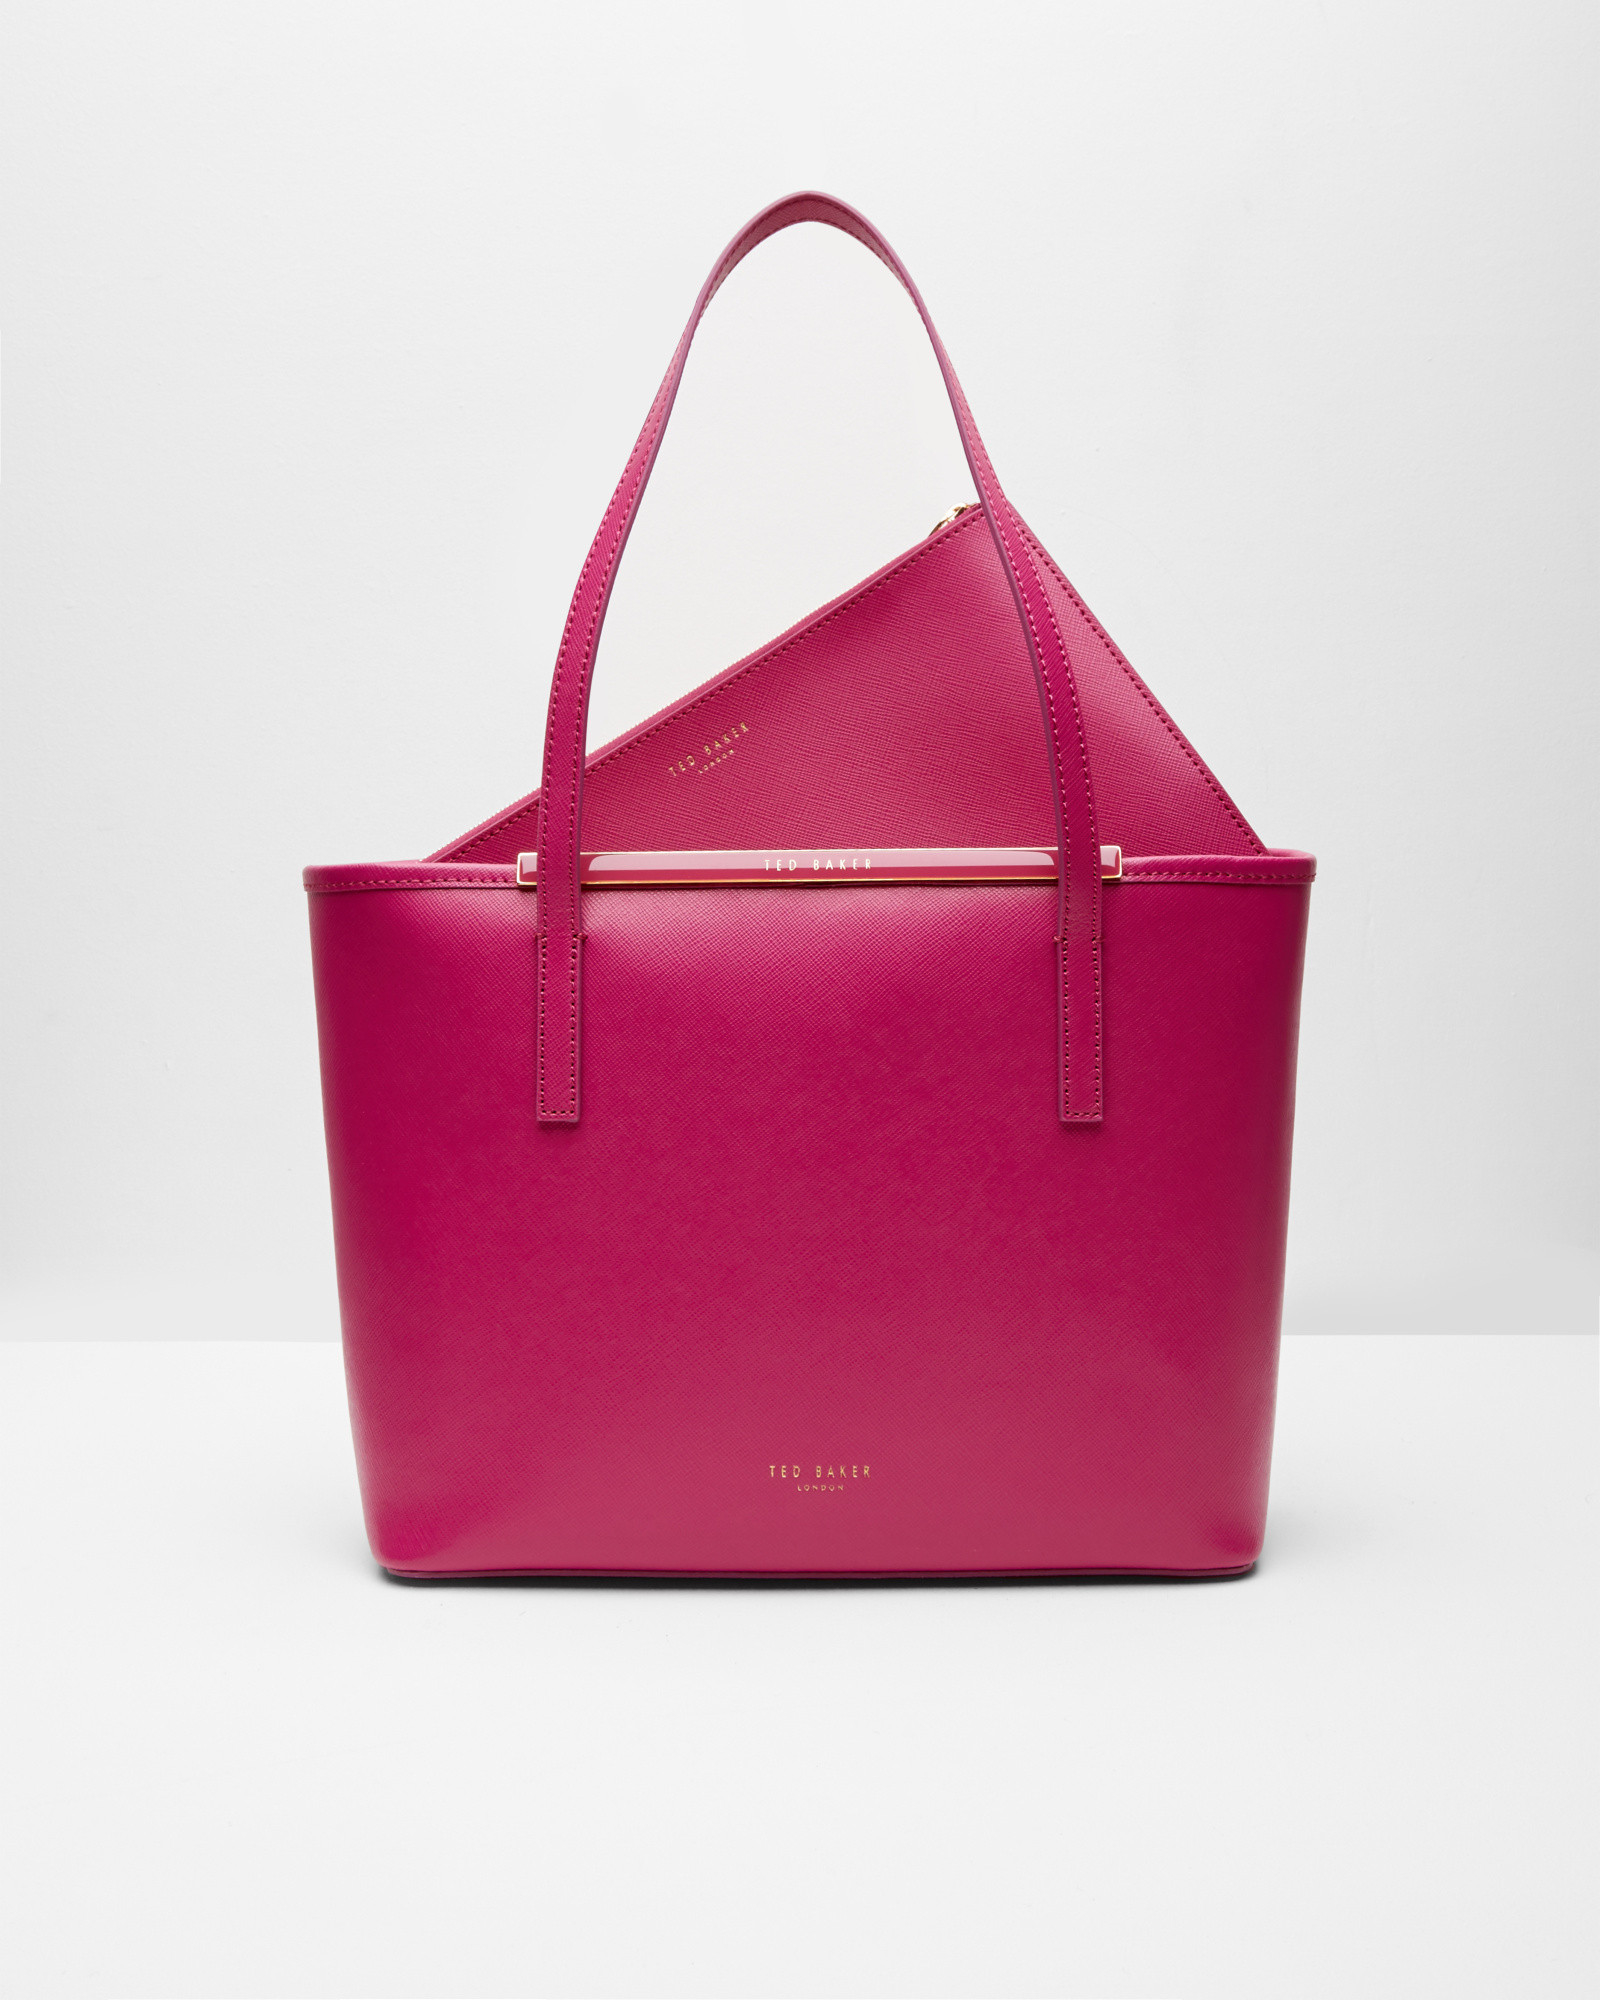 8e7745fe99de89 Ted Baker Crosshatch Leather Small Shopper Bag in Pink - Lyst